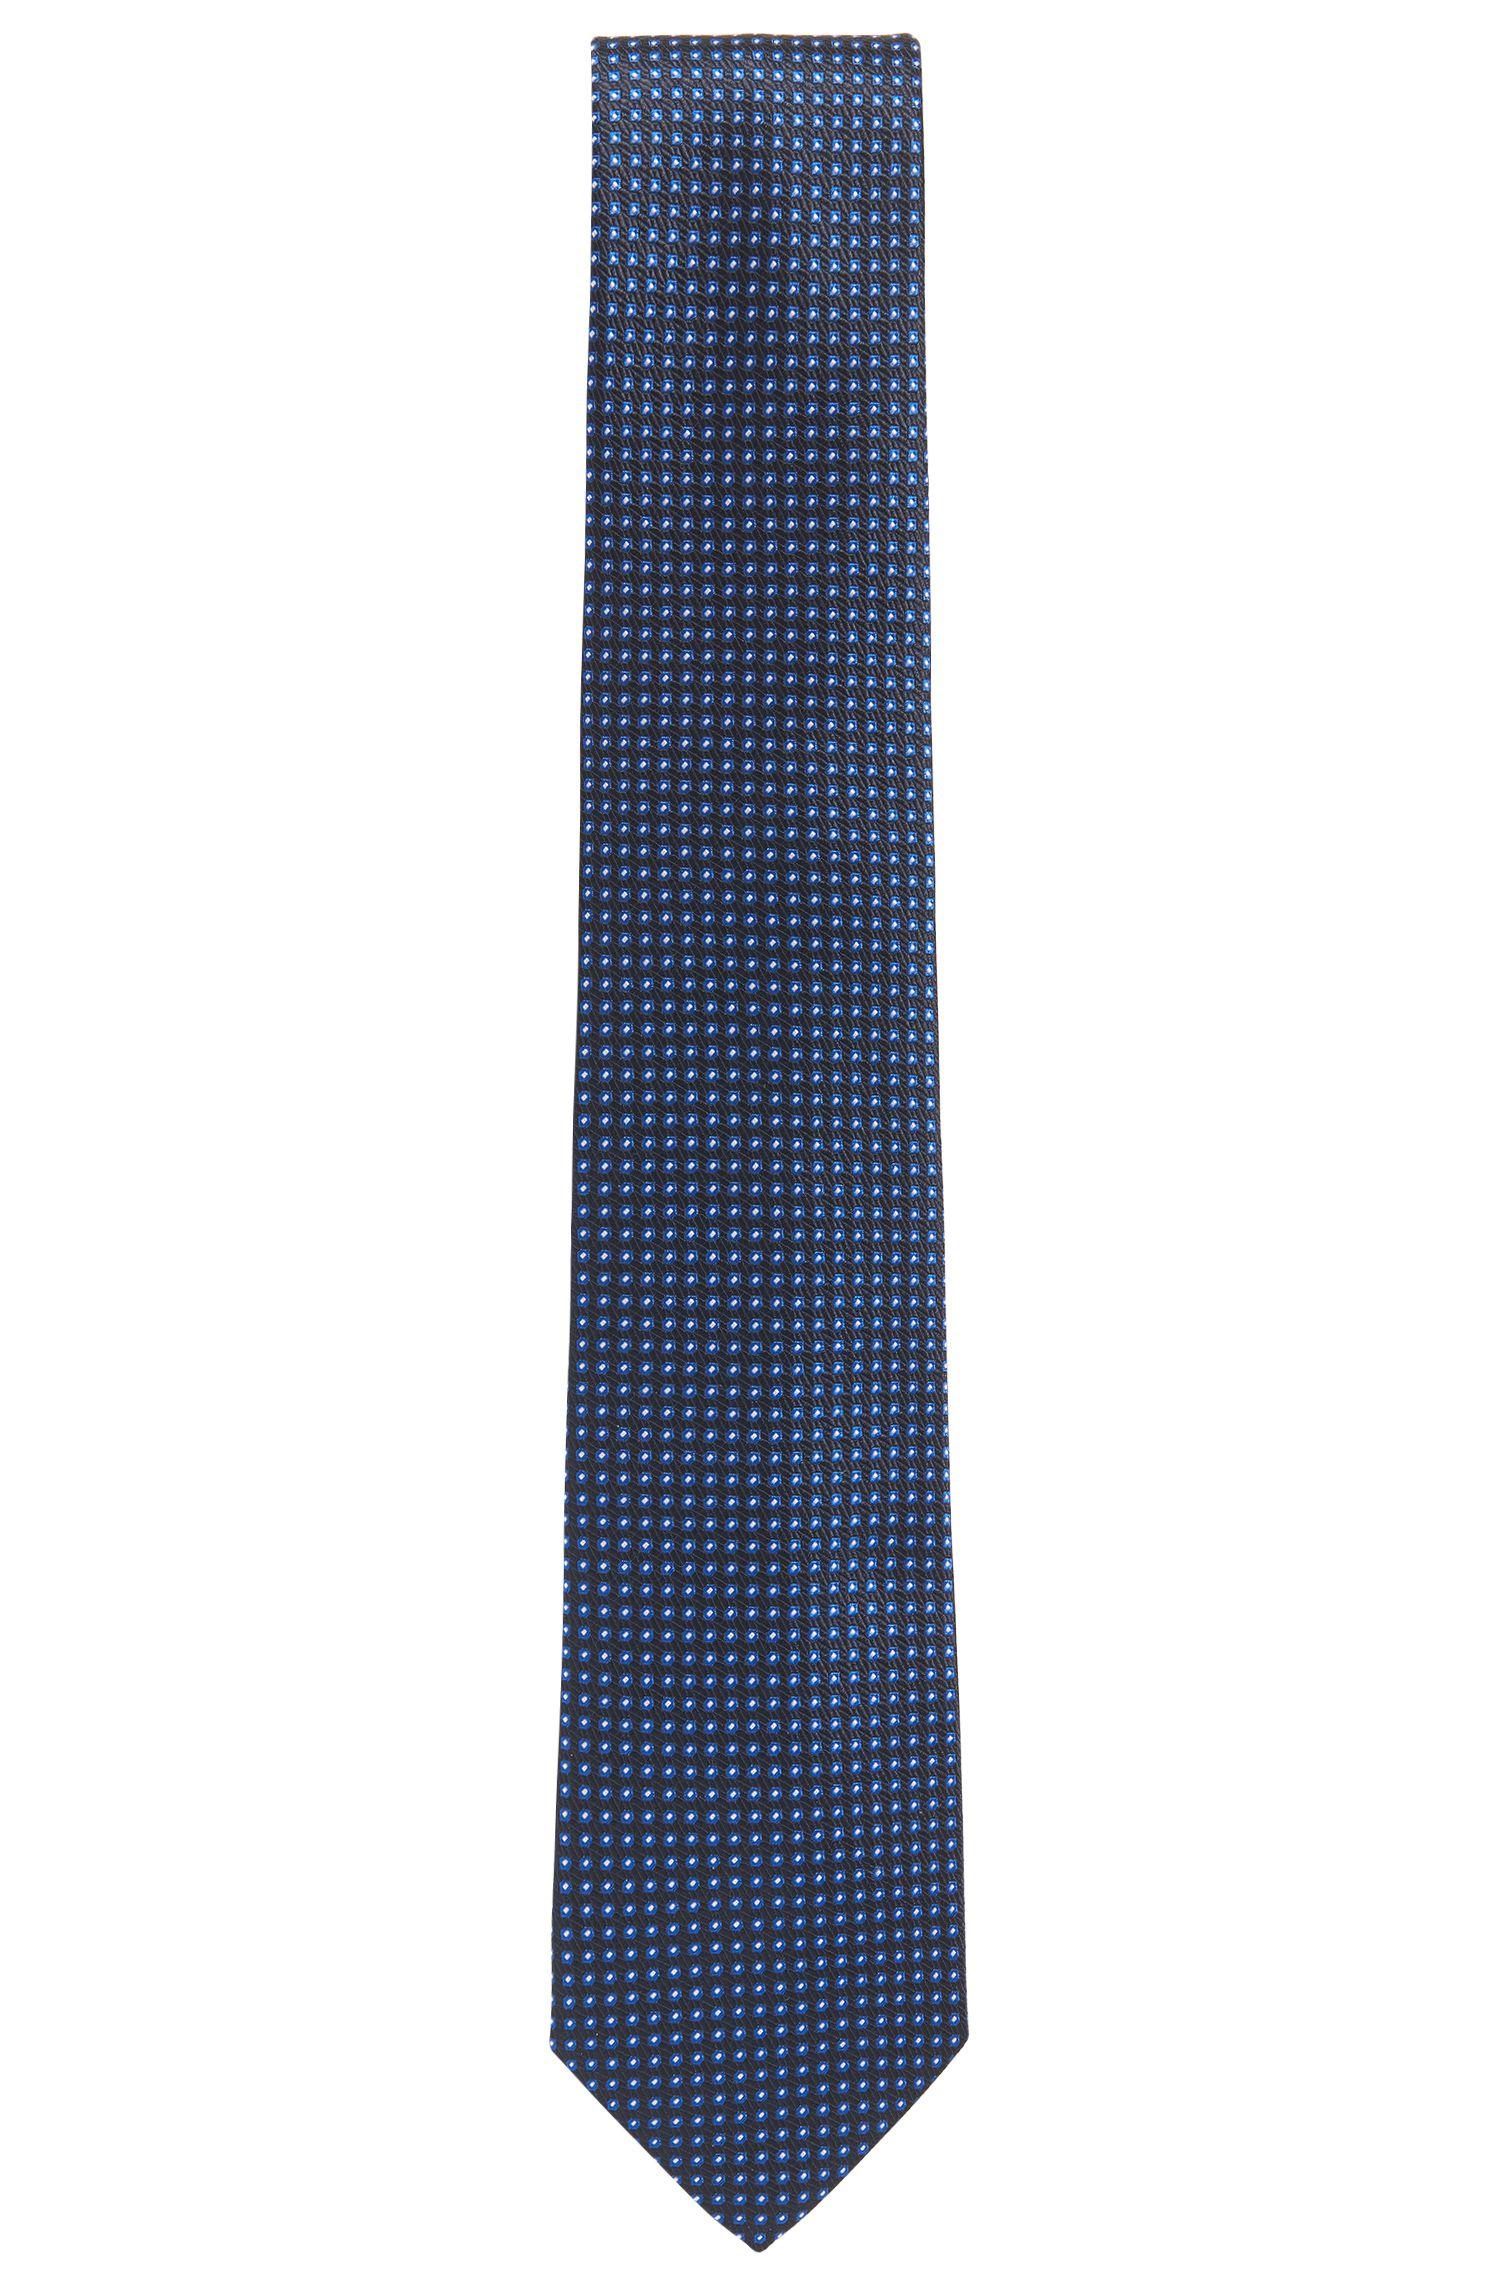 Gemusterte Krawatte aus Seiden-Jacquard